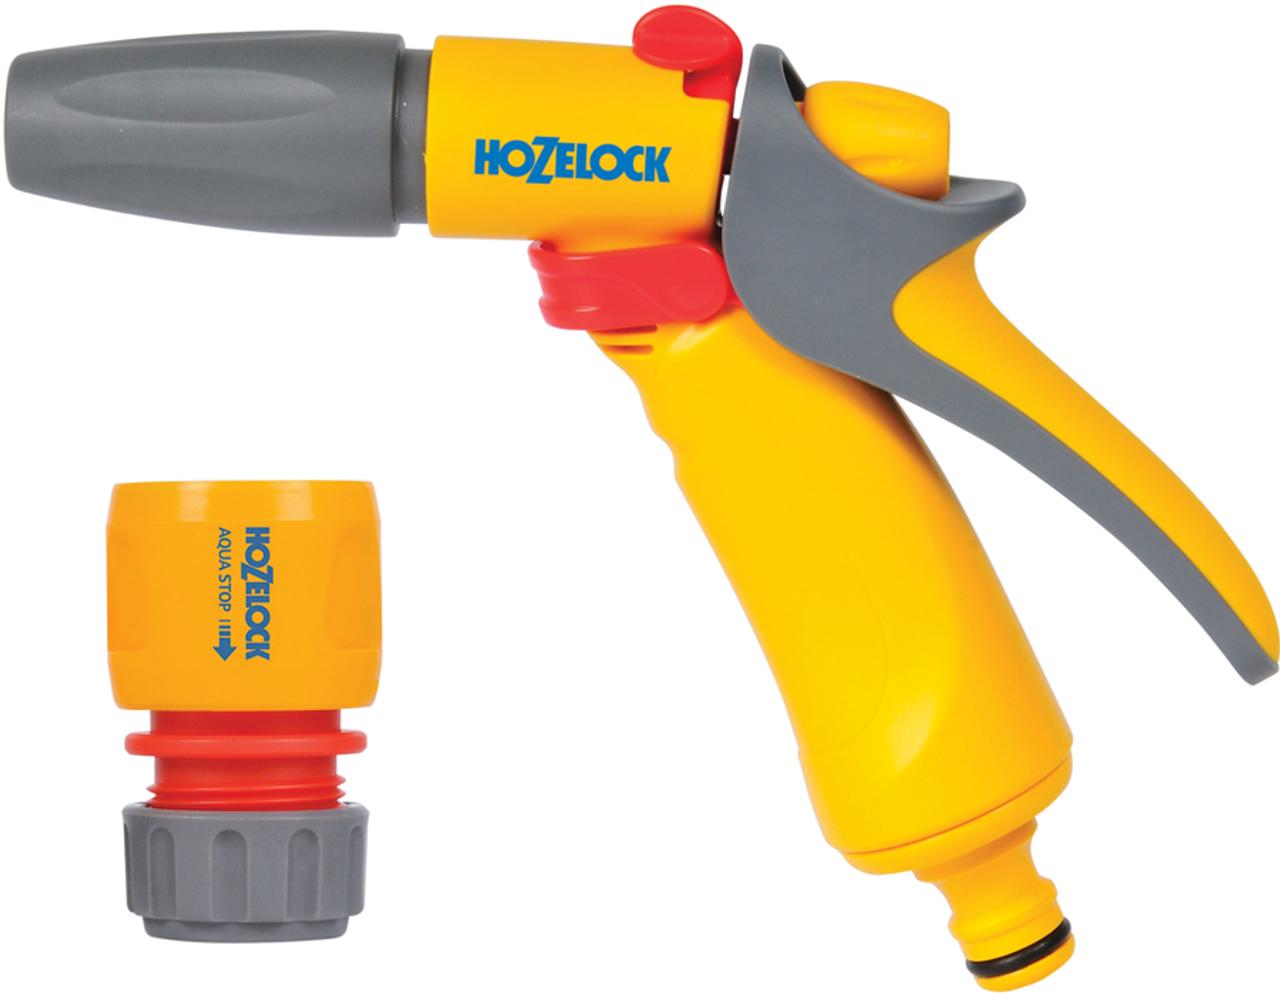 Hozelock 2674 Jet Spray Gun